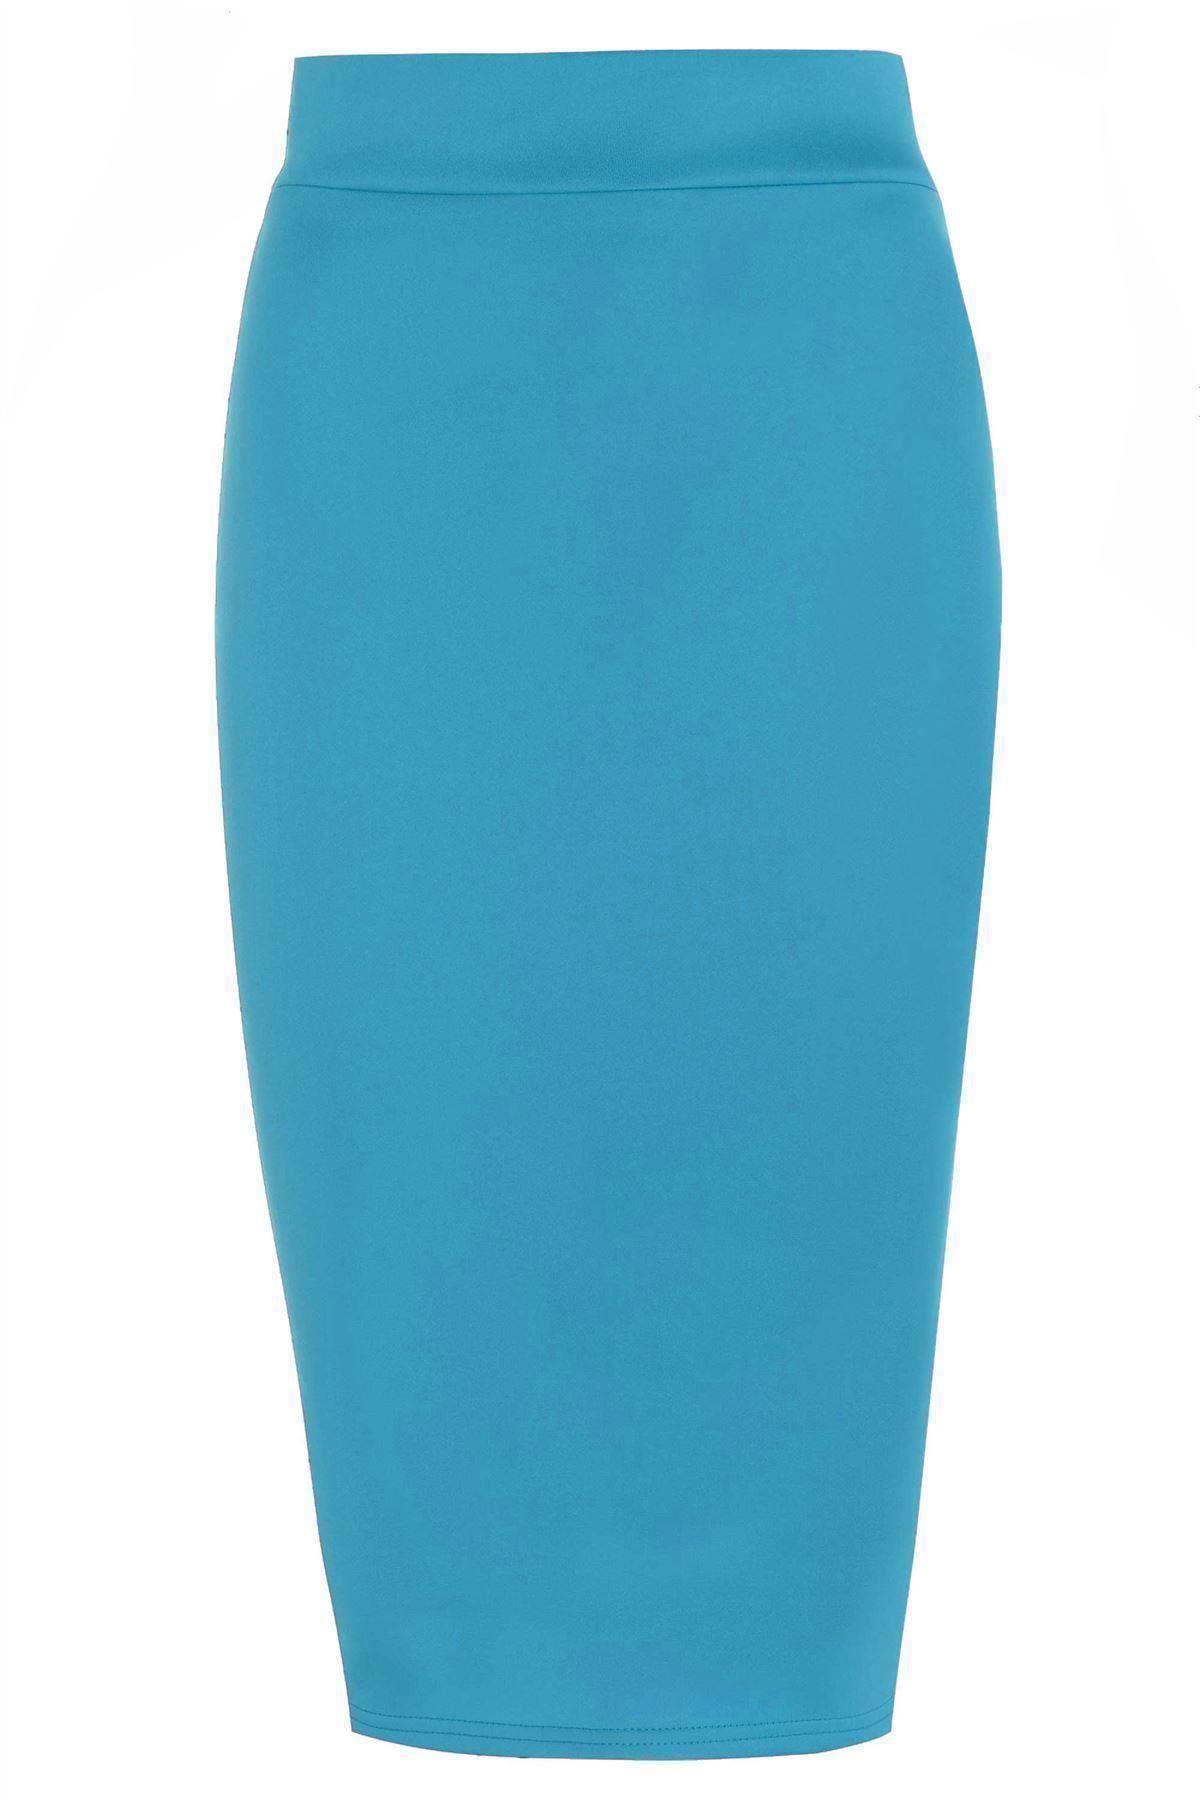 turquoise pencil skirt ebay